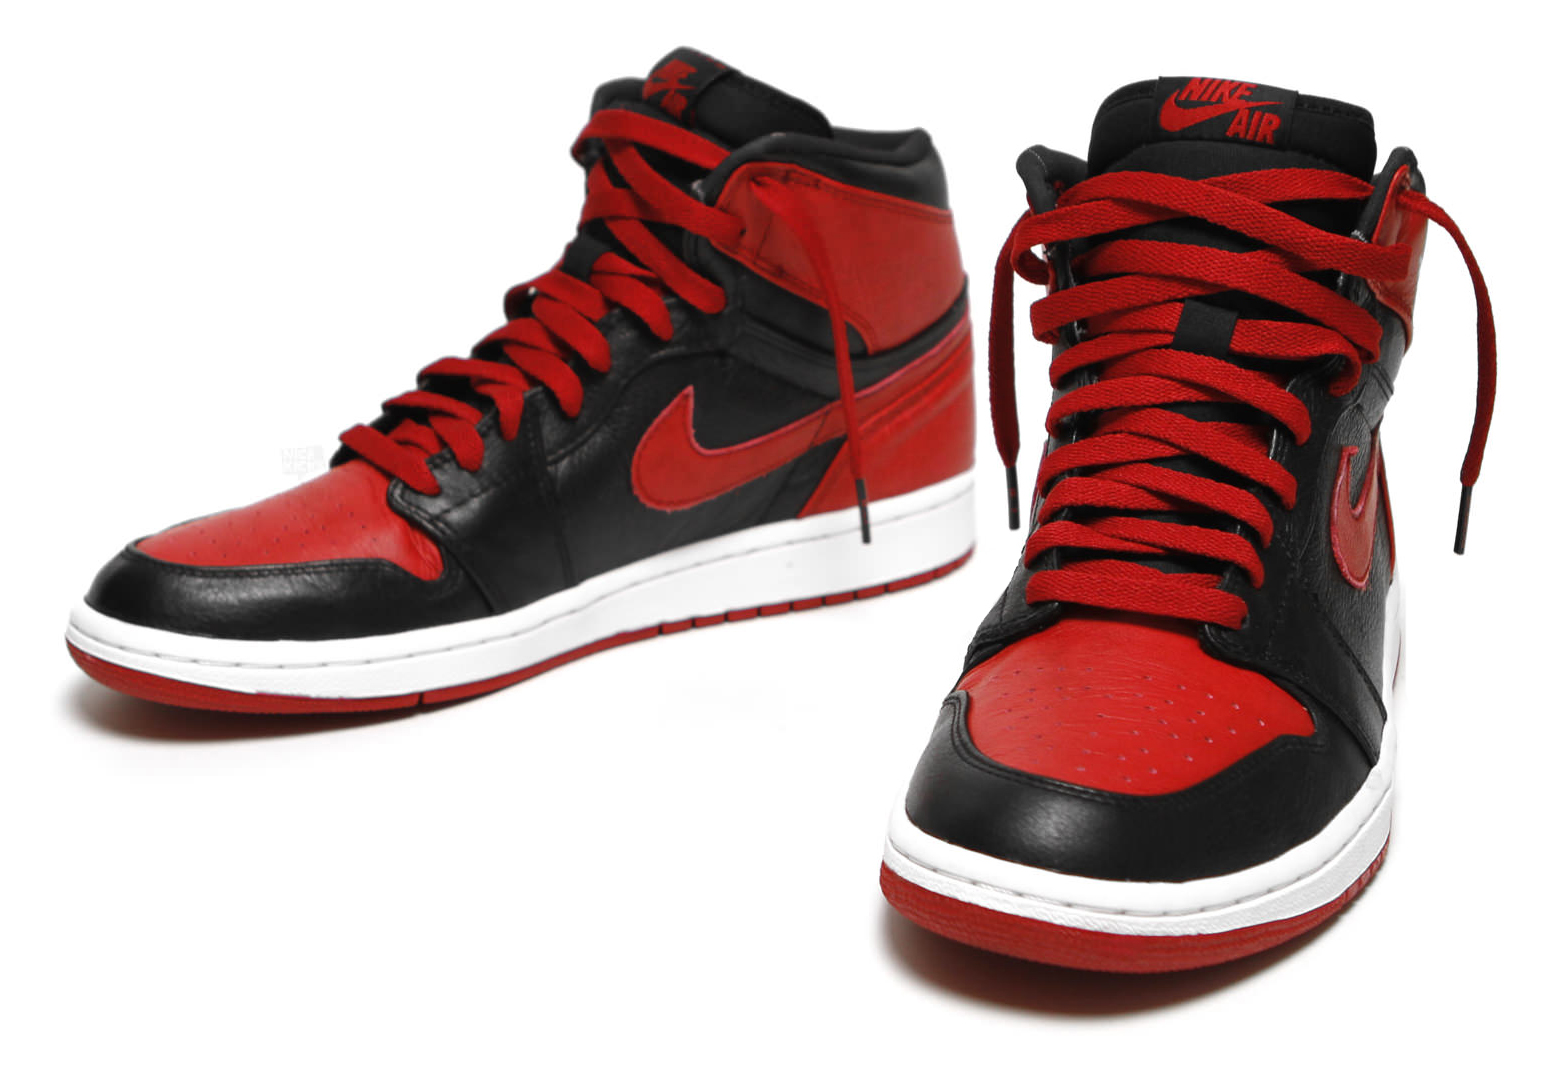 big sale 06c3f 1dfa8 Air Jordan 1 History, Colorways, & Release Dates | Nice Kicks